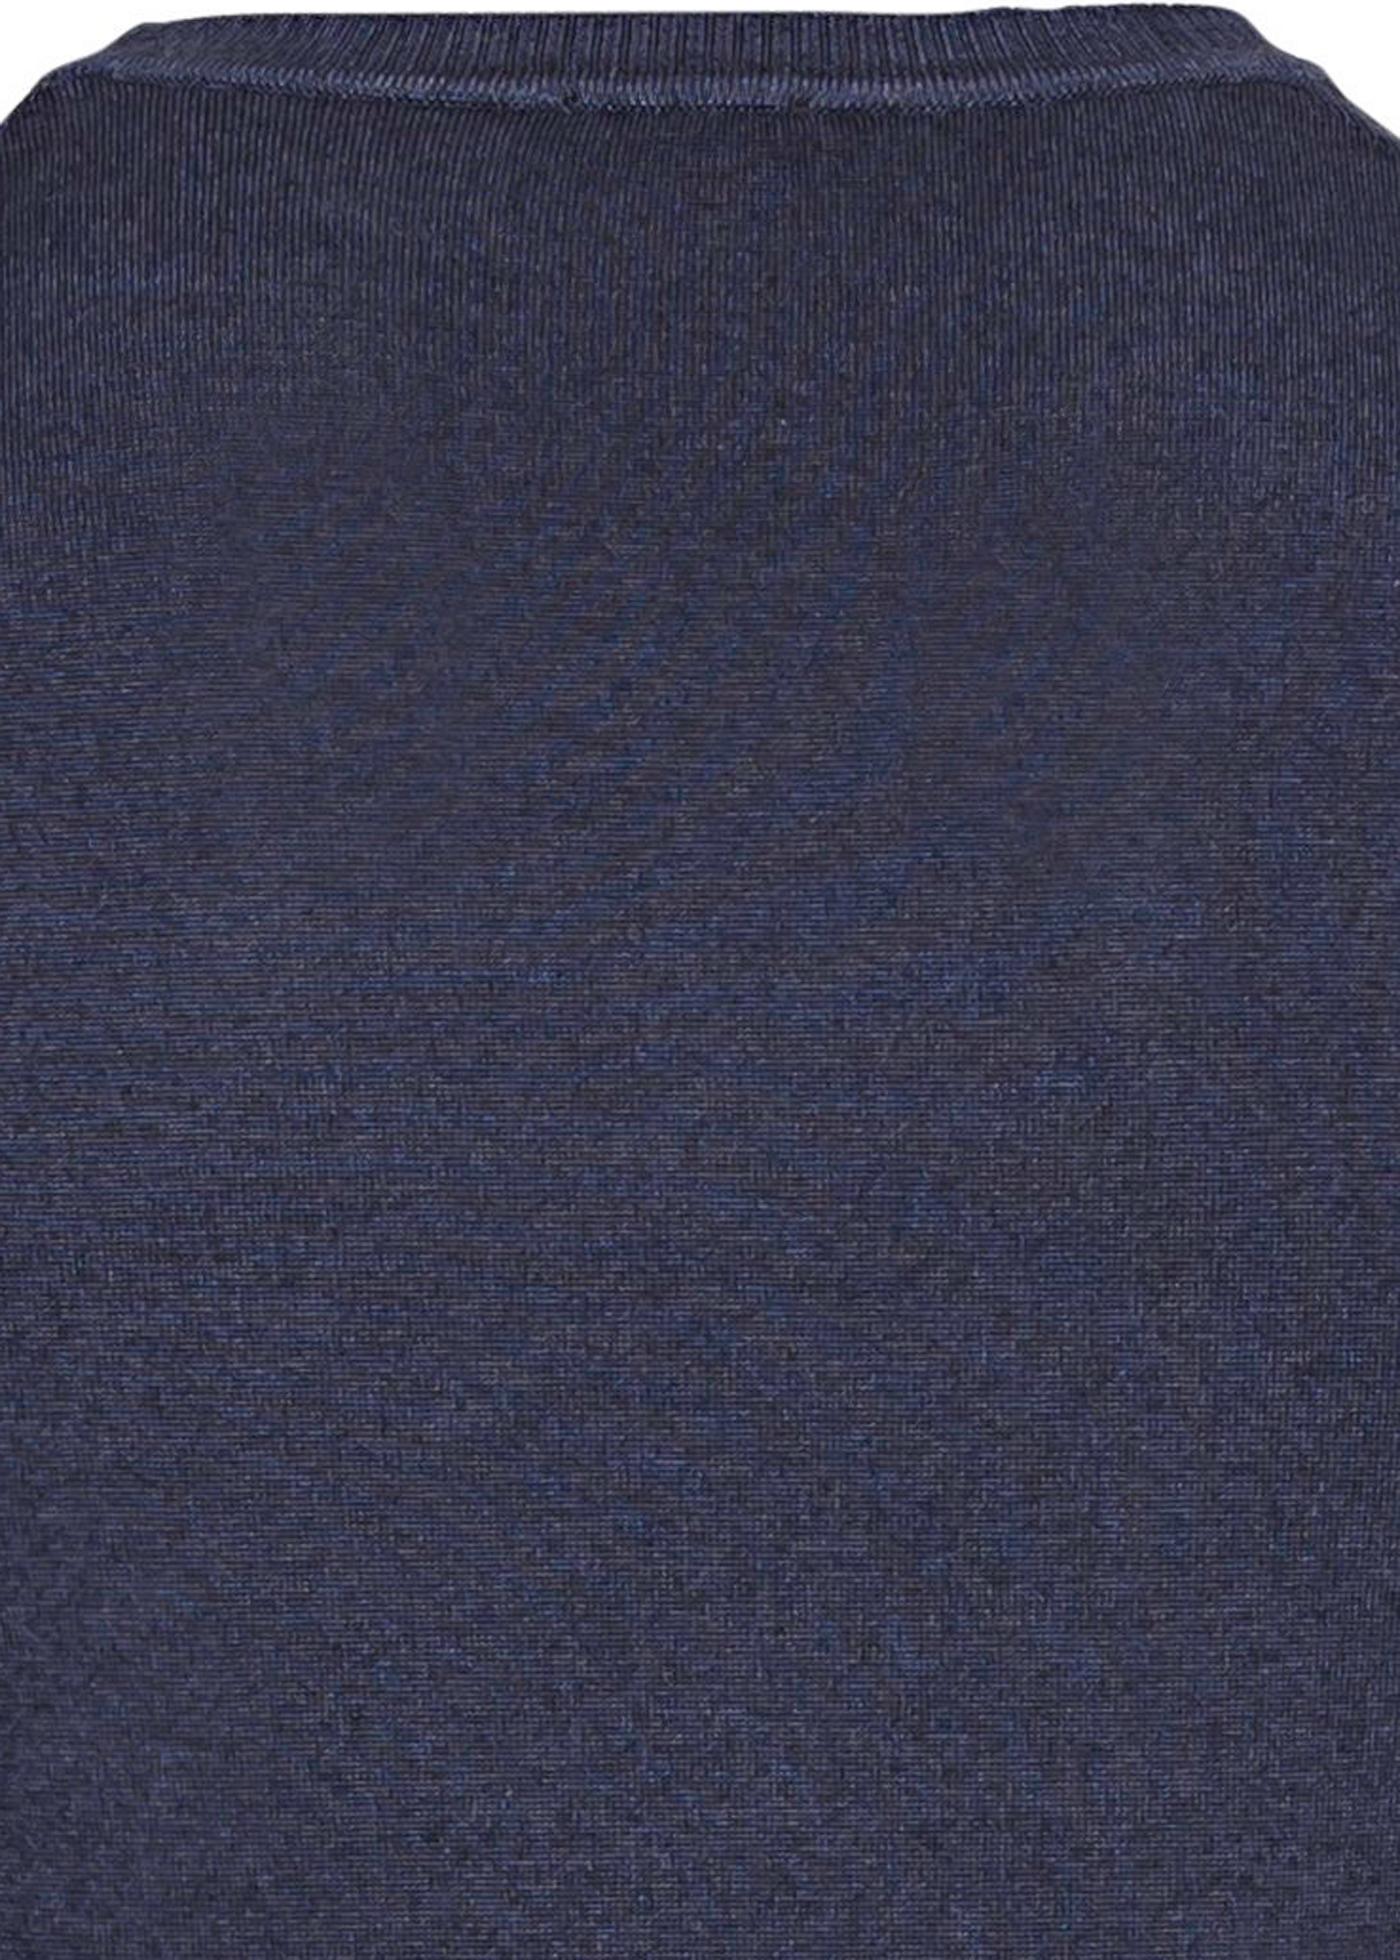 Garm Dyed Merino Crew image number 3